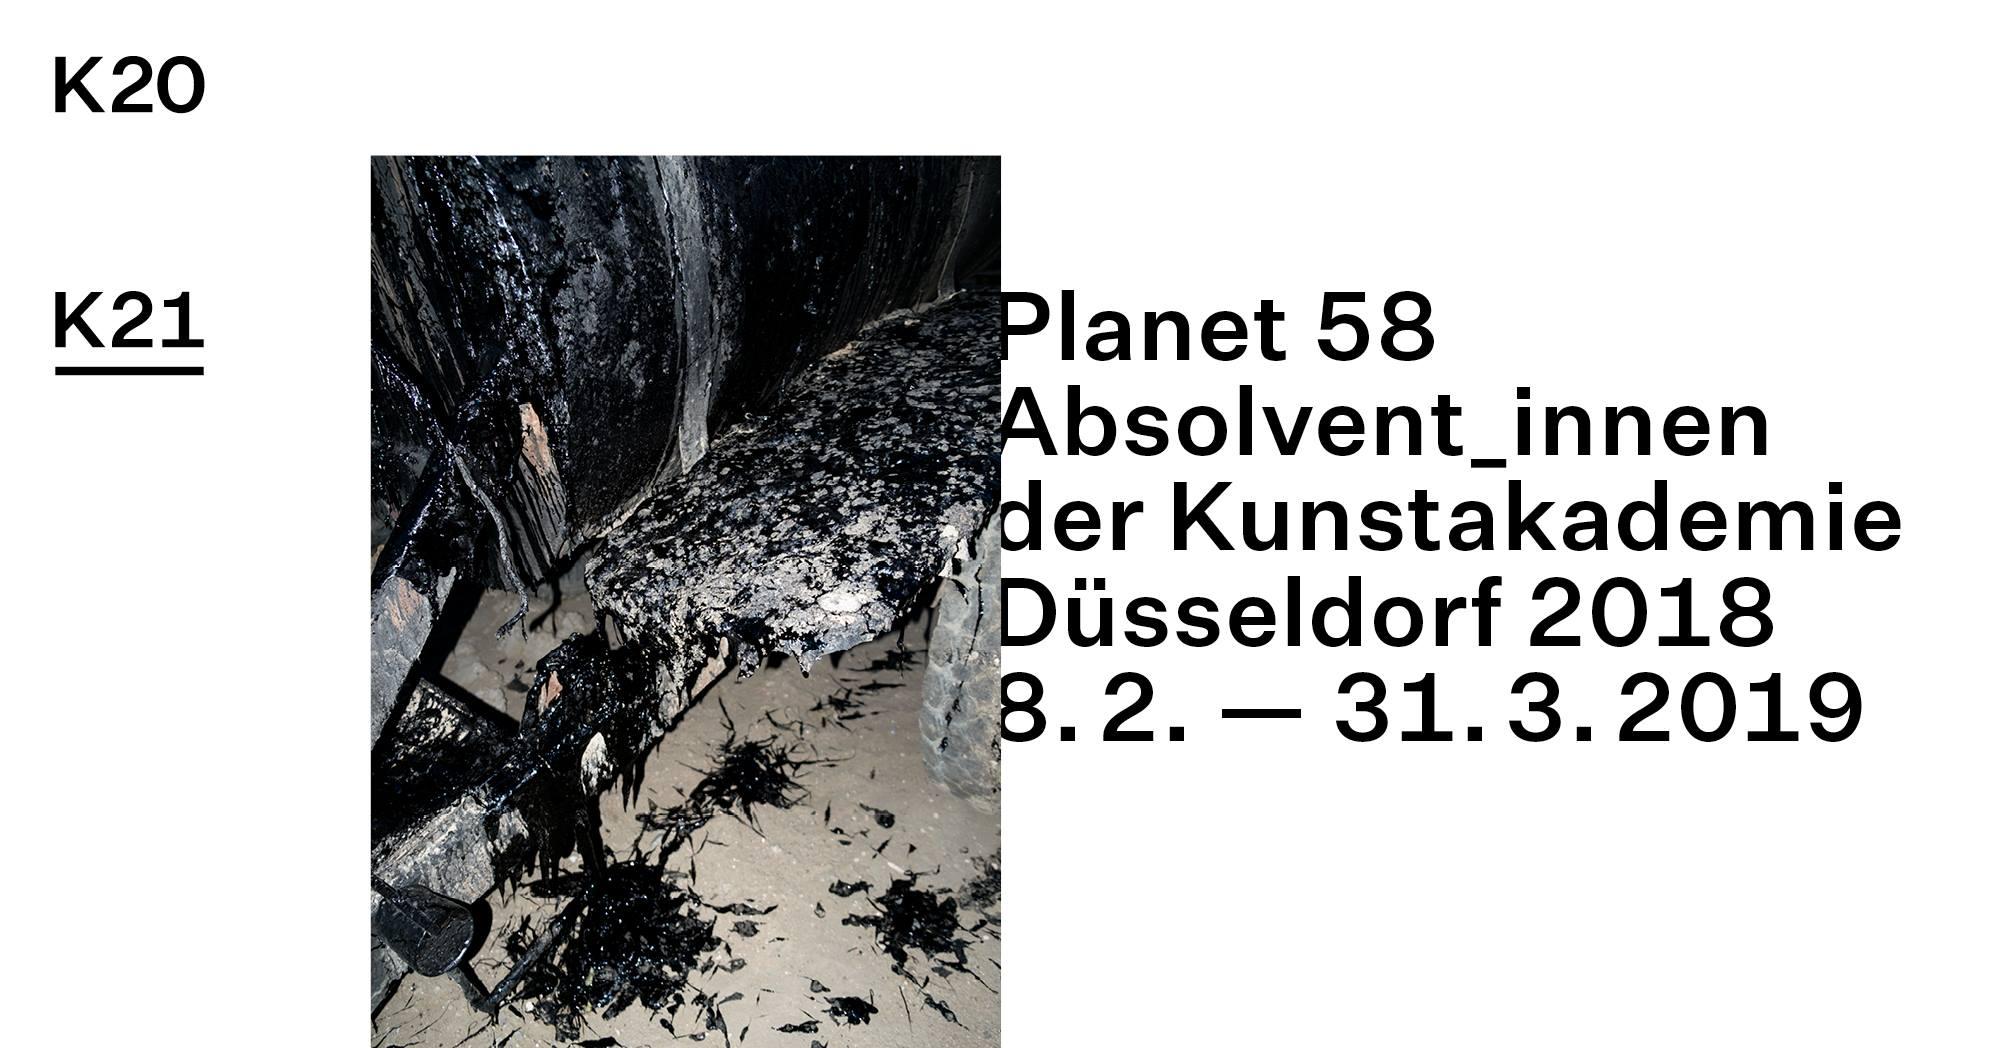 Anibal Kostka Kunstakademie Düsseldorf Rundgang 2019 Kunstsammlung NRW K21